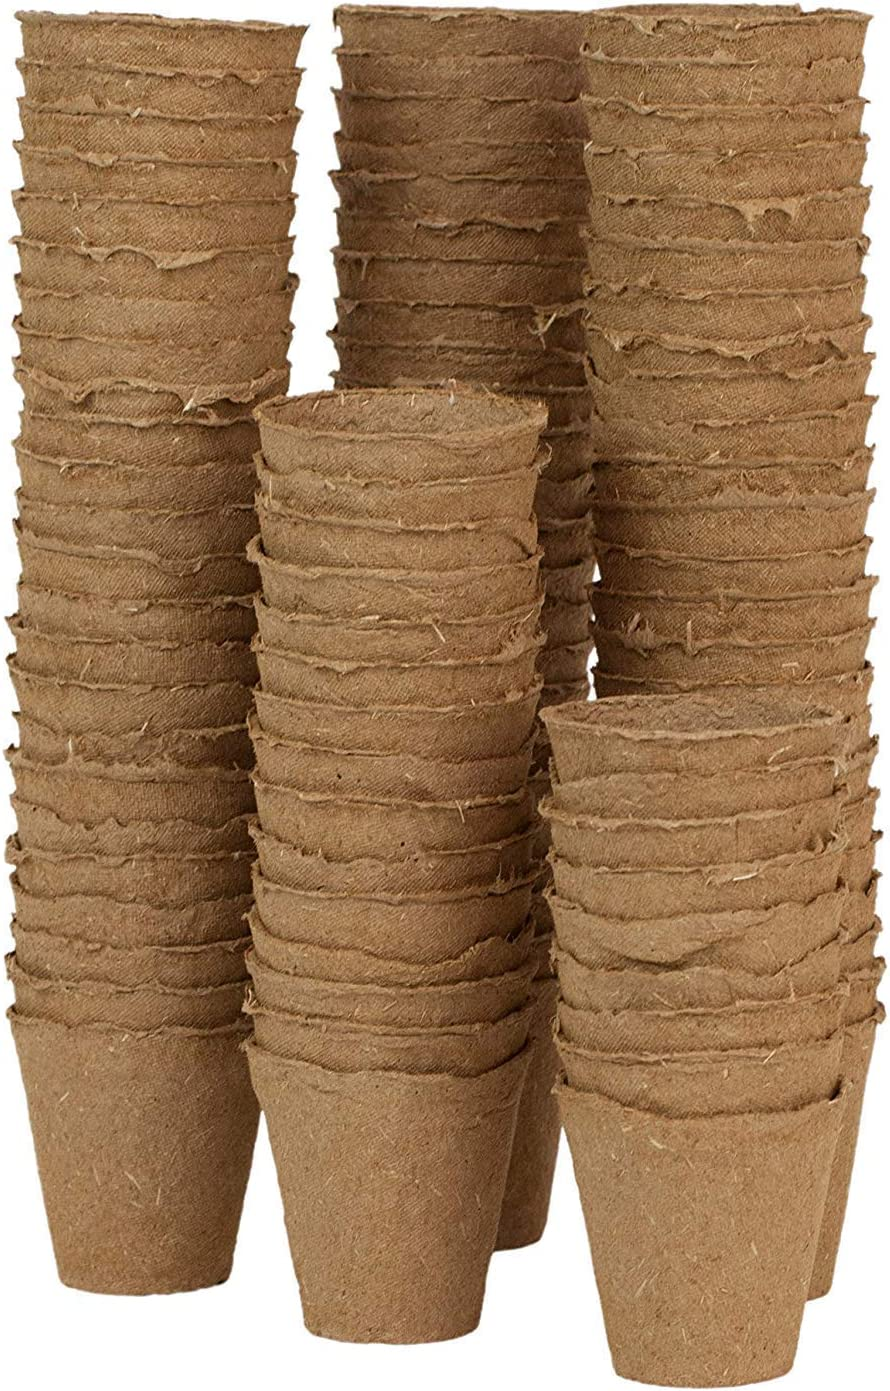 WARKHOME Semilleros Biodegradables Redondos,Macetas de Fibra (96 Unidades, Forma Redonda,6 cm)